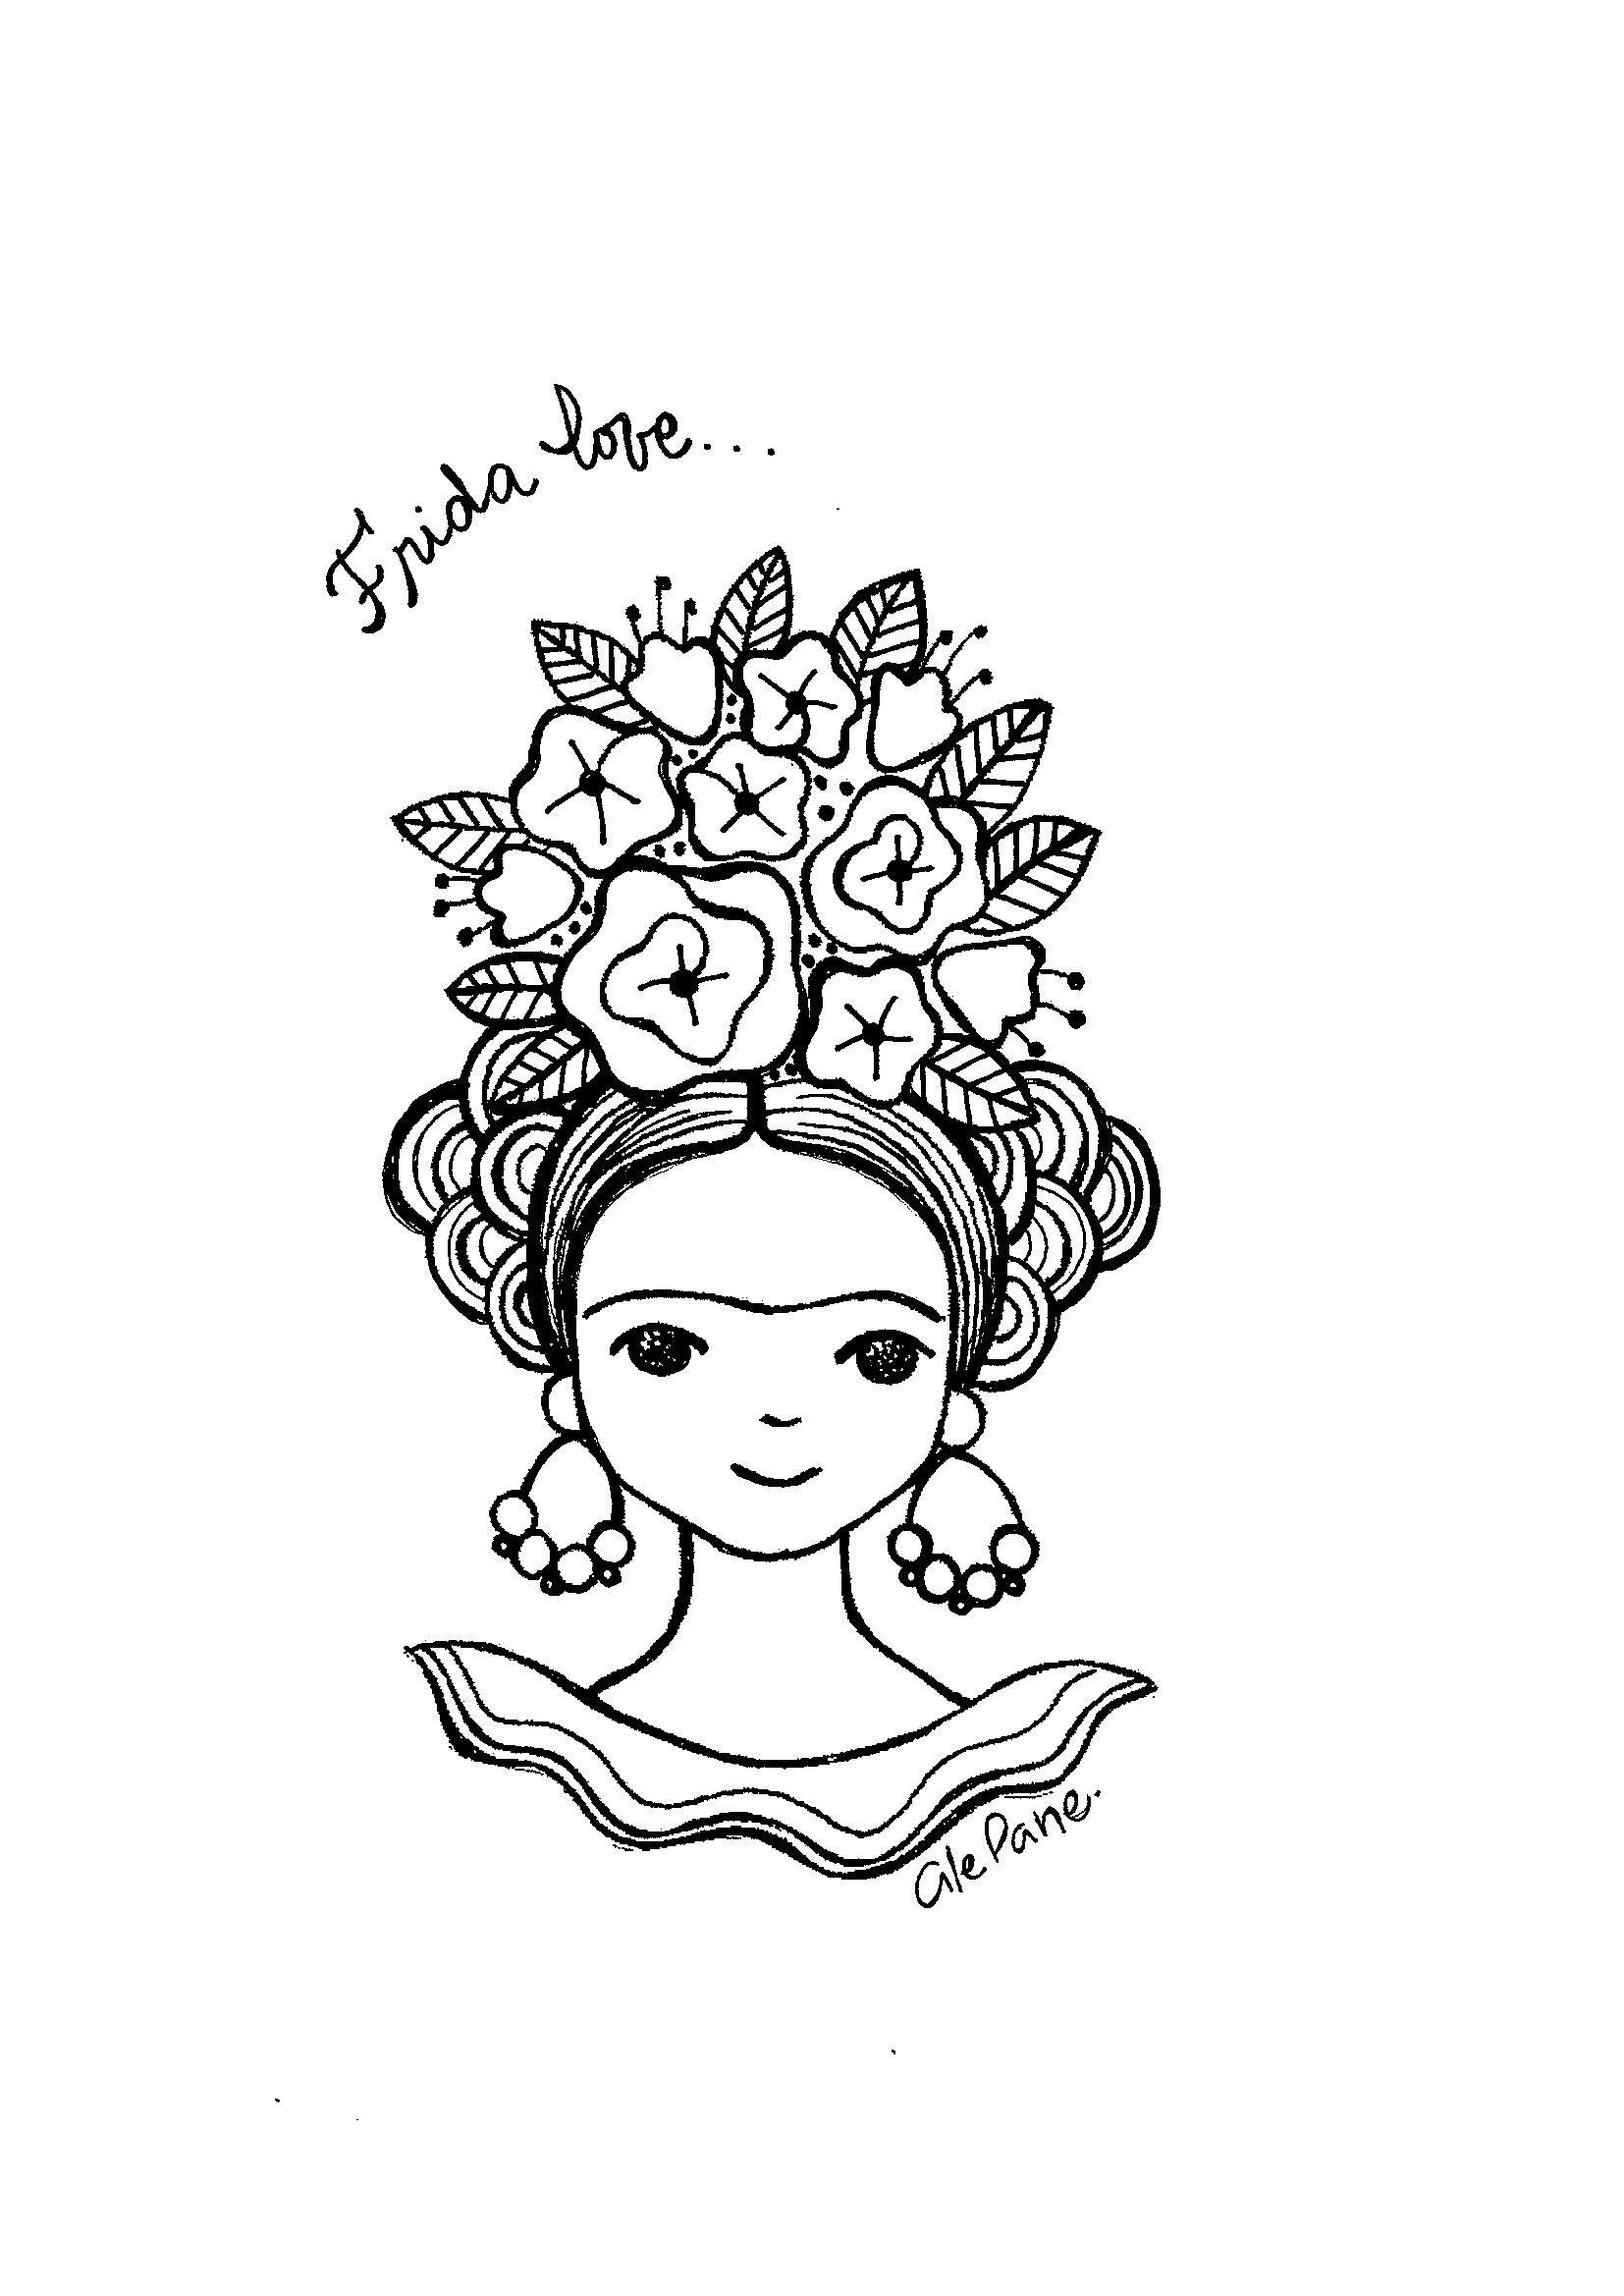 Frida Love En 2020 Frida Kahlo Dibujo Frida Kahlo Caricatura Frida Dibujo